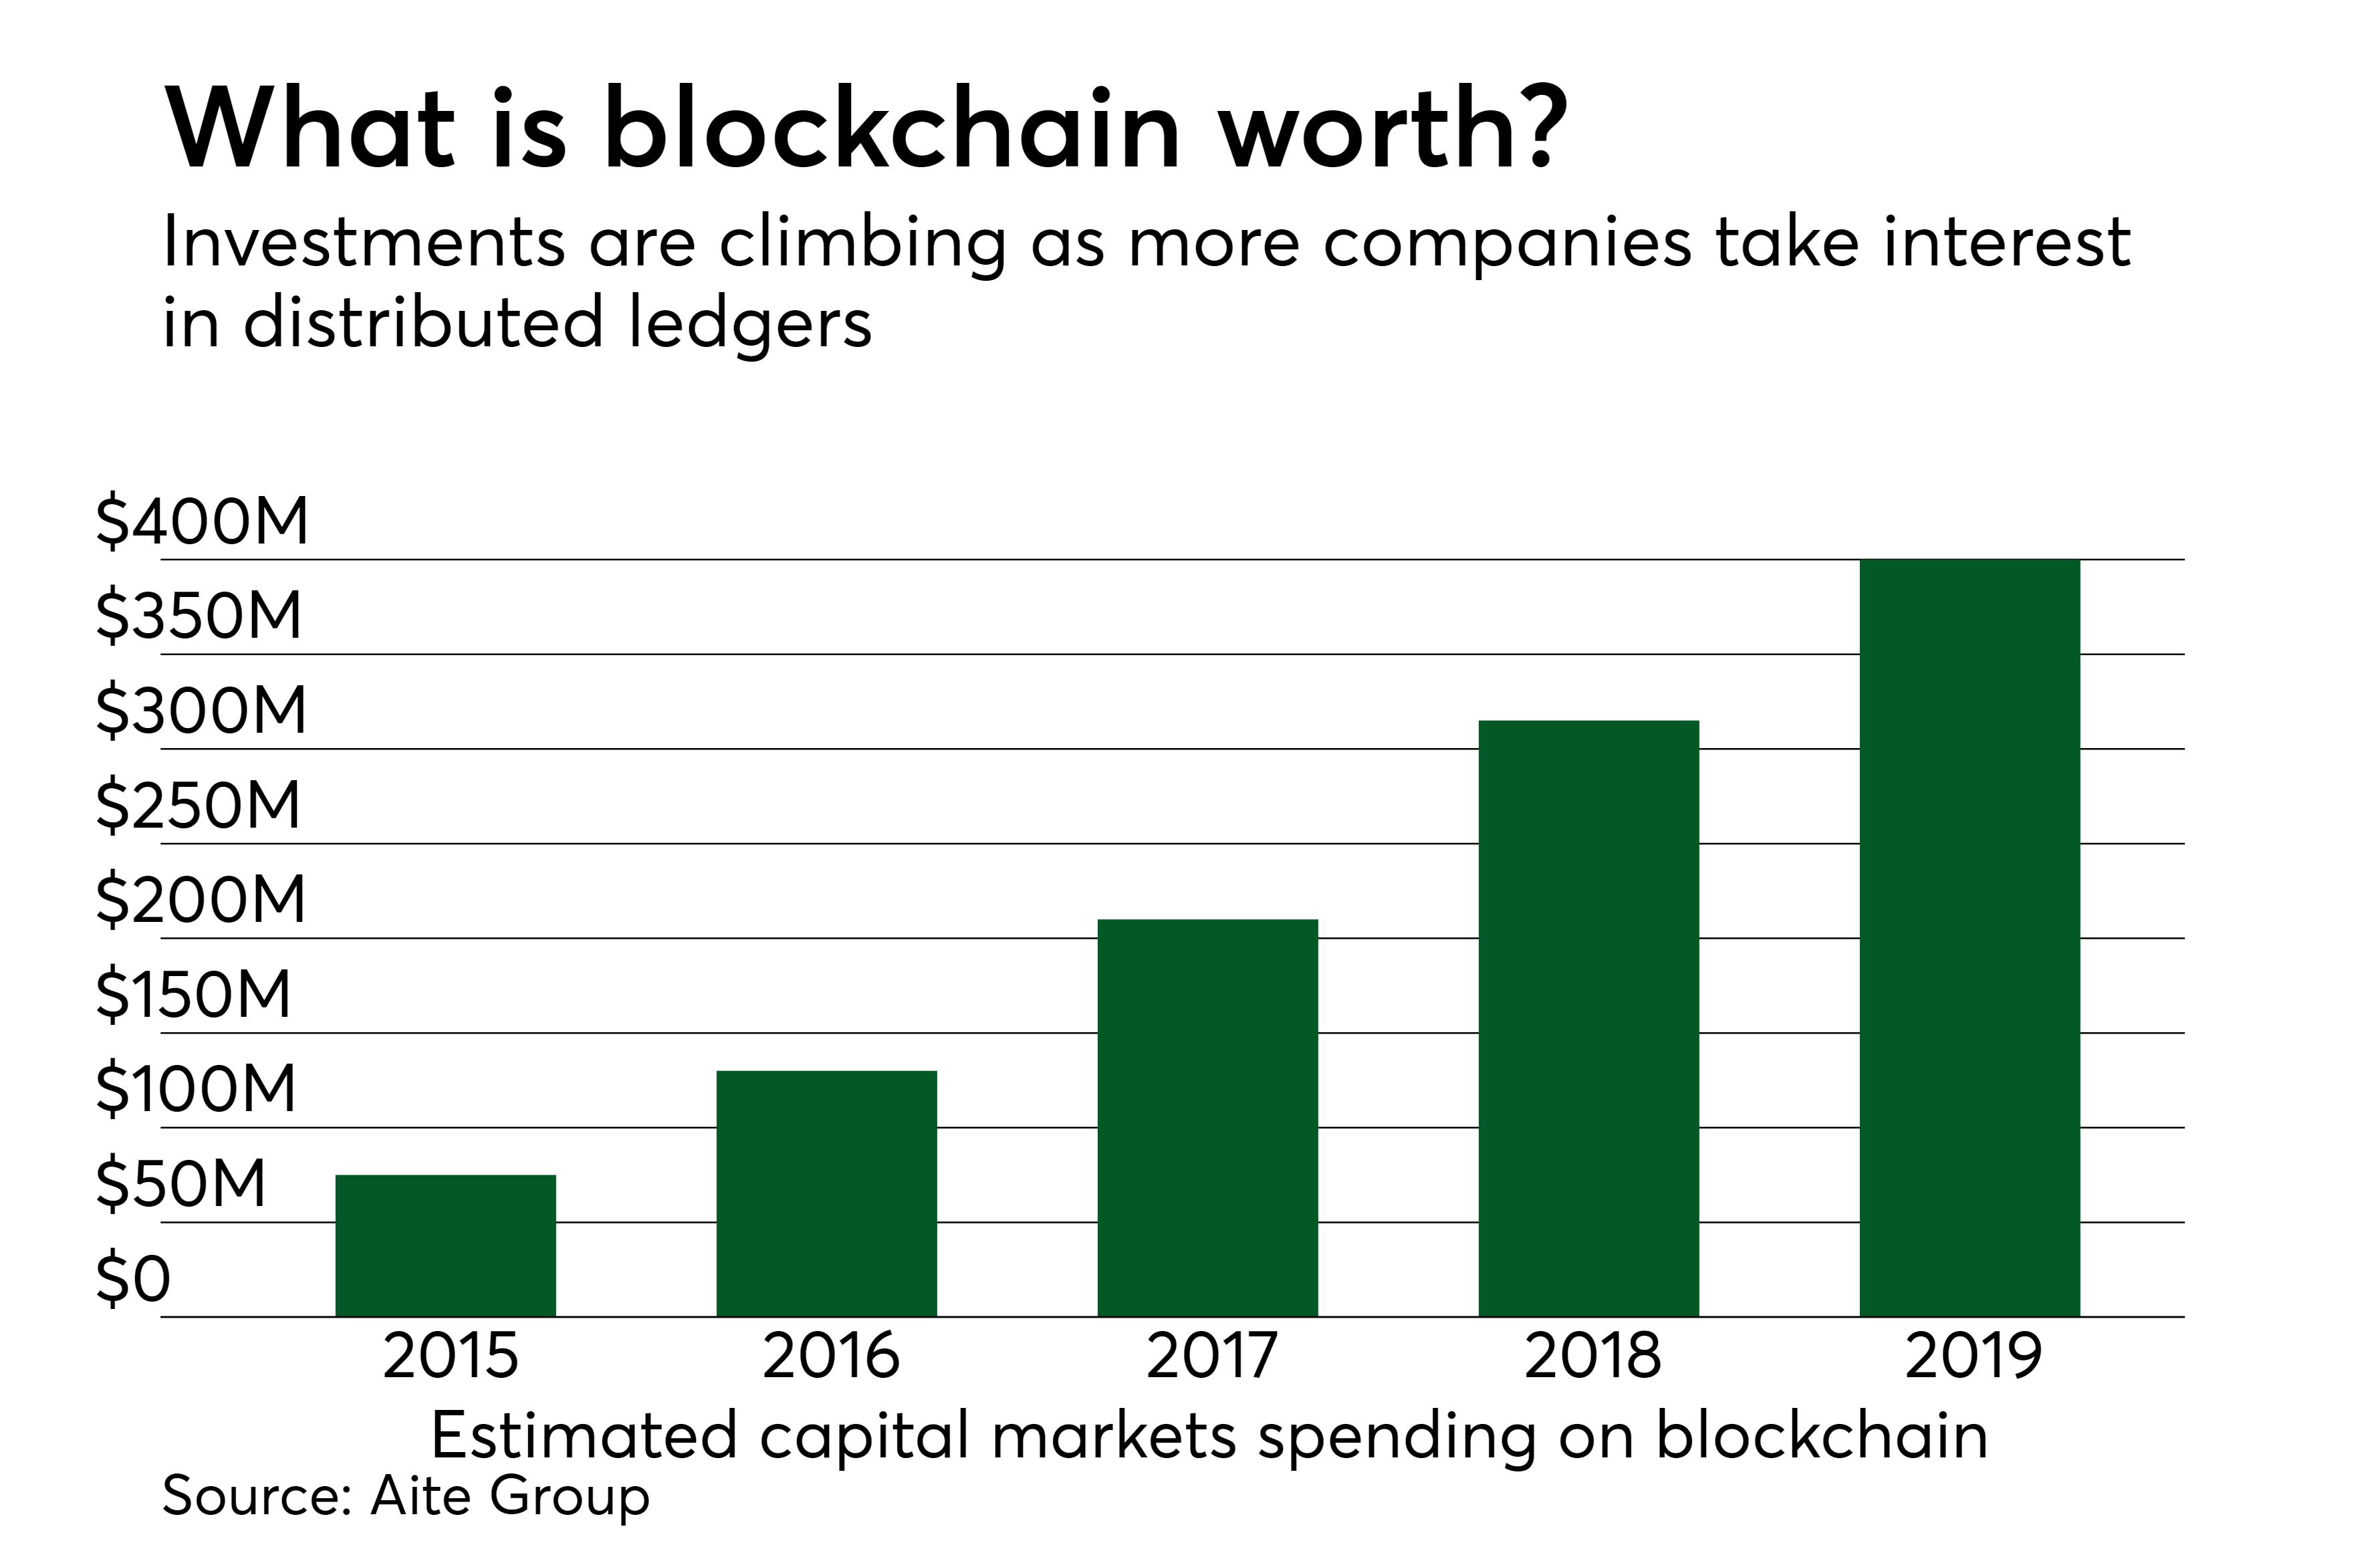 https://assets.sourcemedia.com/23/f8/4f6d70d5456abf1a16c6eb722a0a/3-26-18-pso-blockchain-spending-1.png